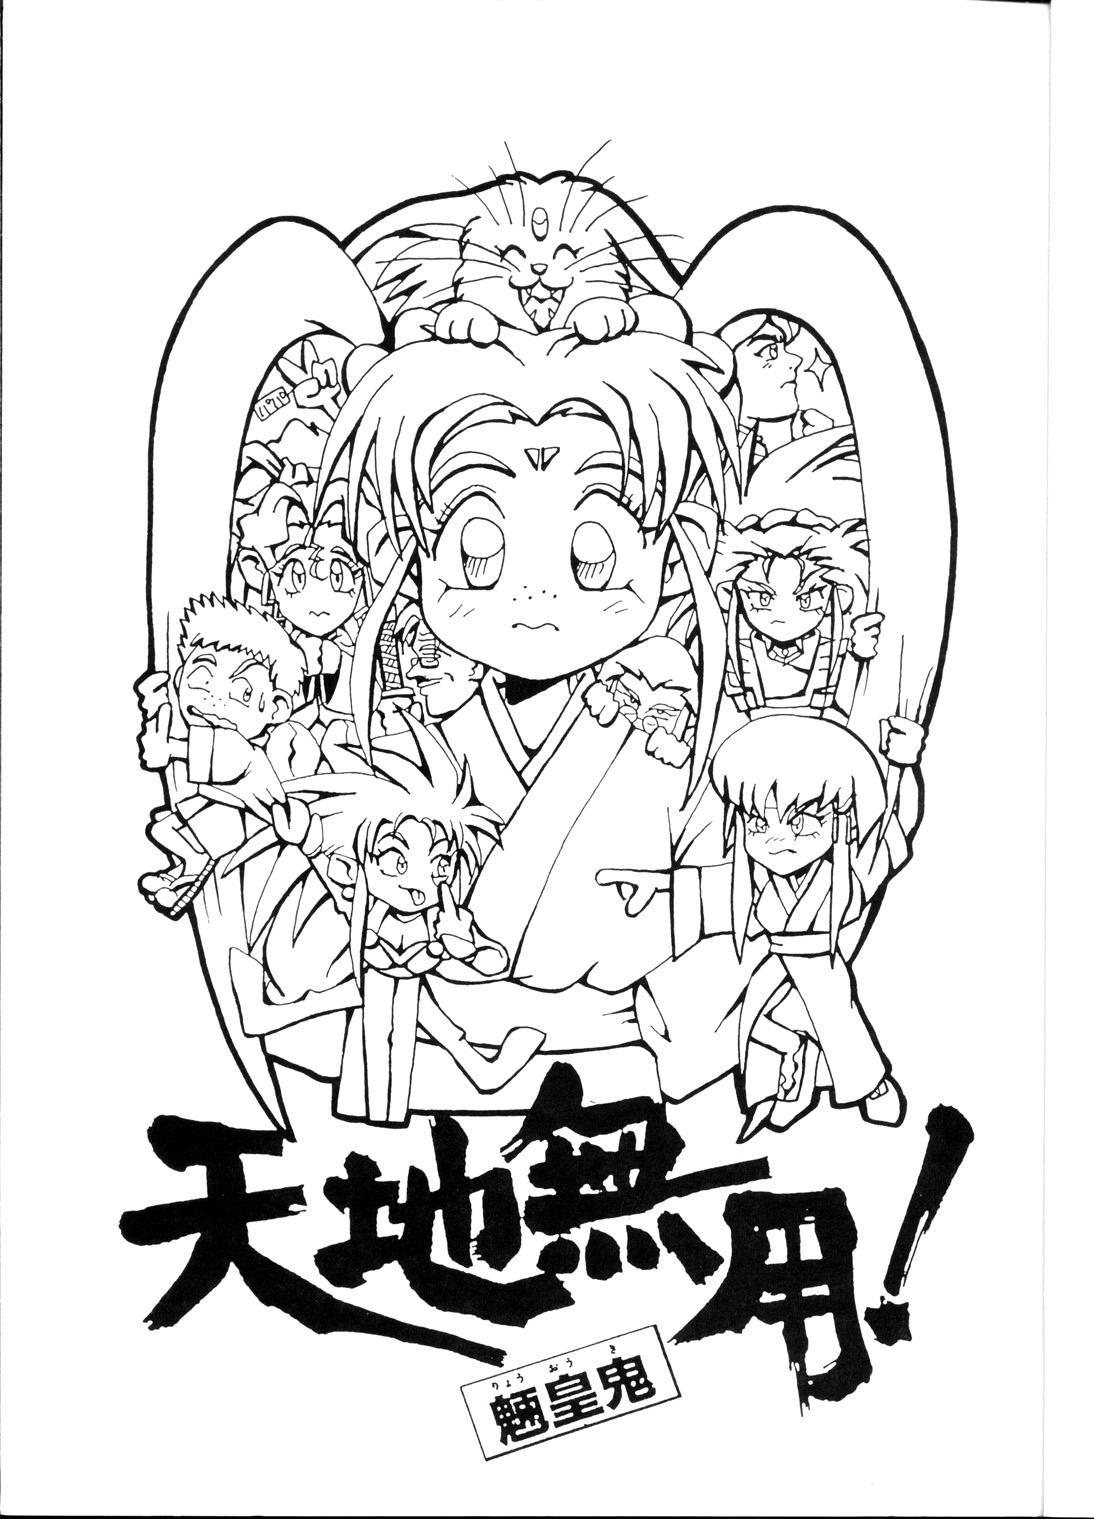 [B.B.C] Tenchi Muyou! Ryou-ou-ki Kaiteiben (Tenchi Muyou!) 1